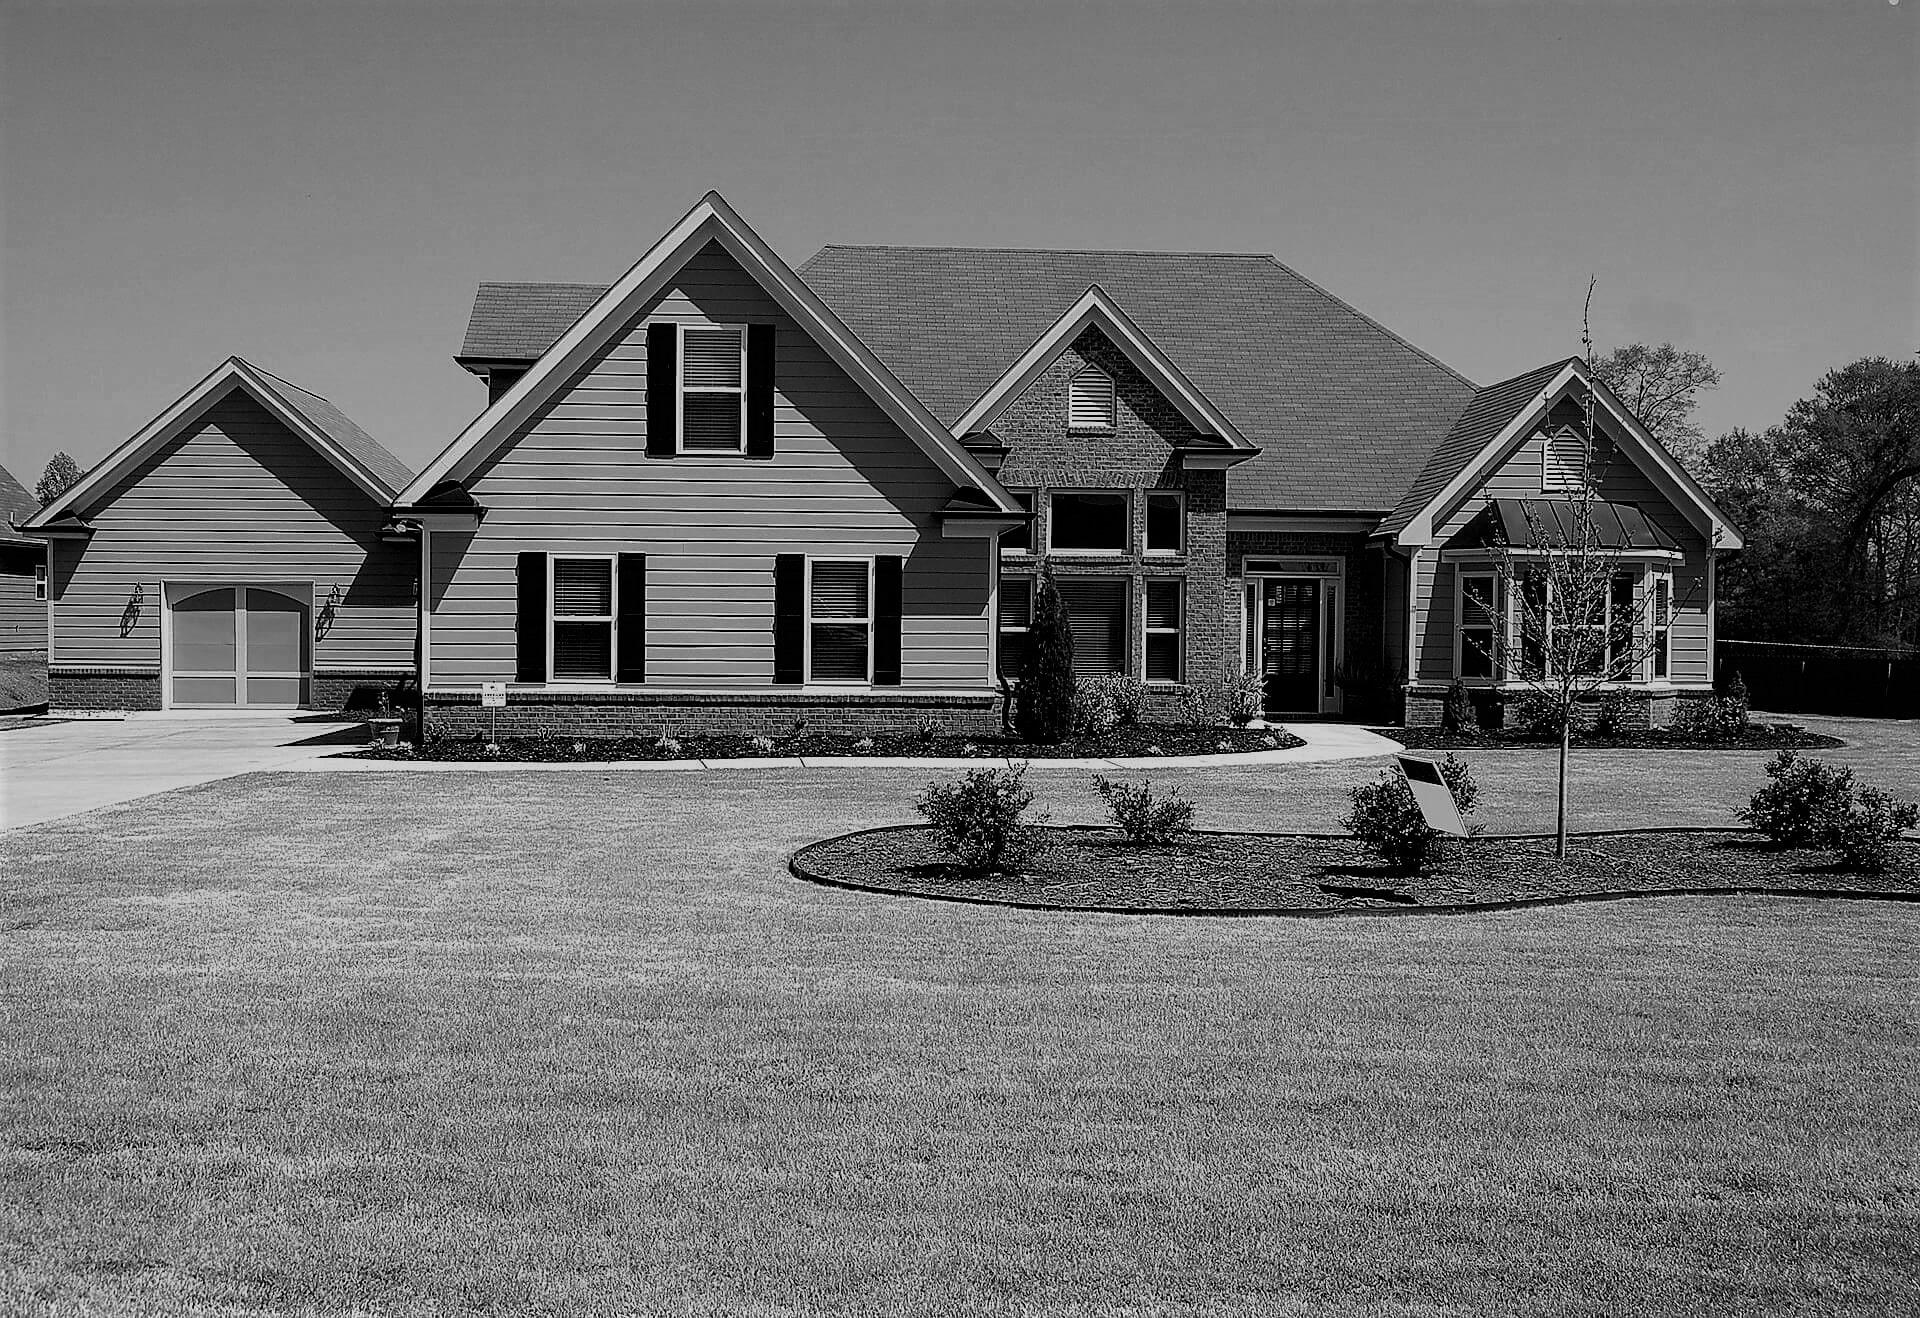 Link-Advance-Home-Loan-Myths